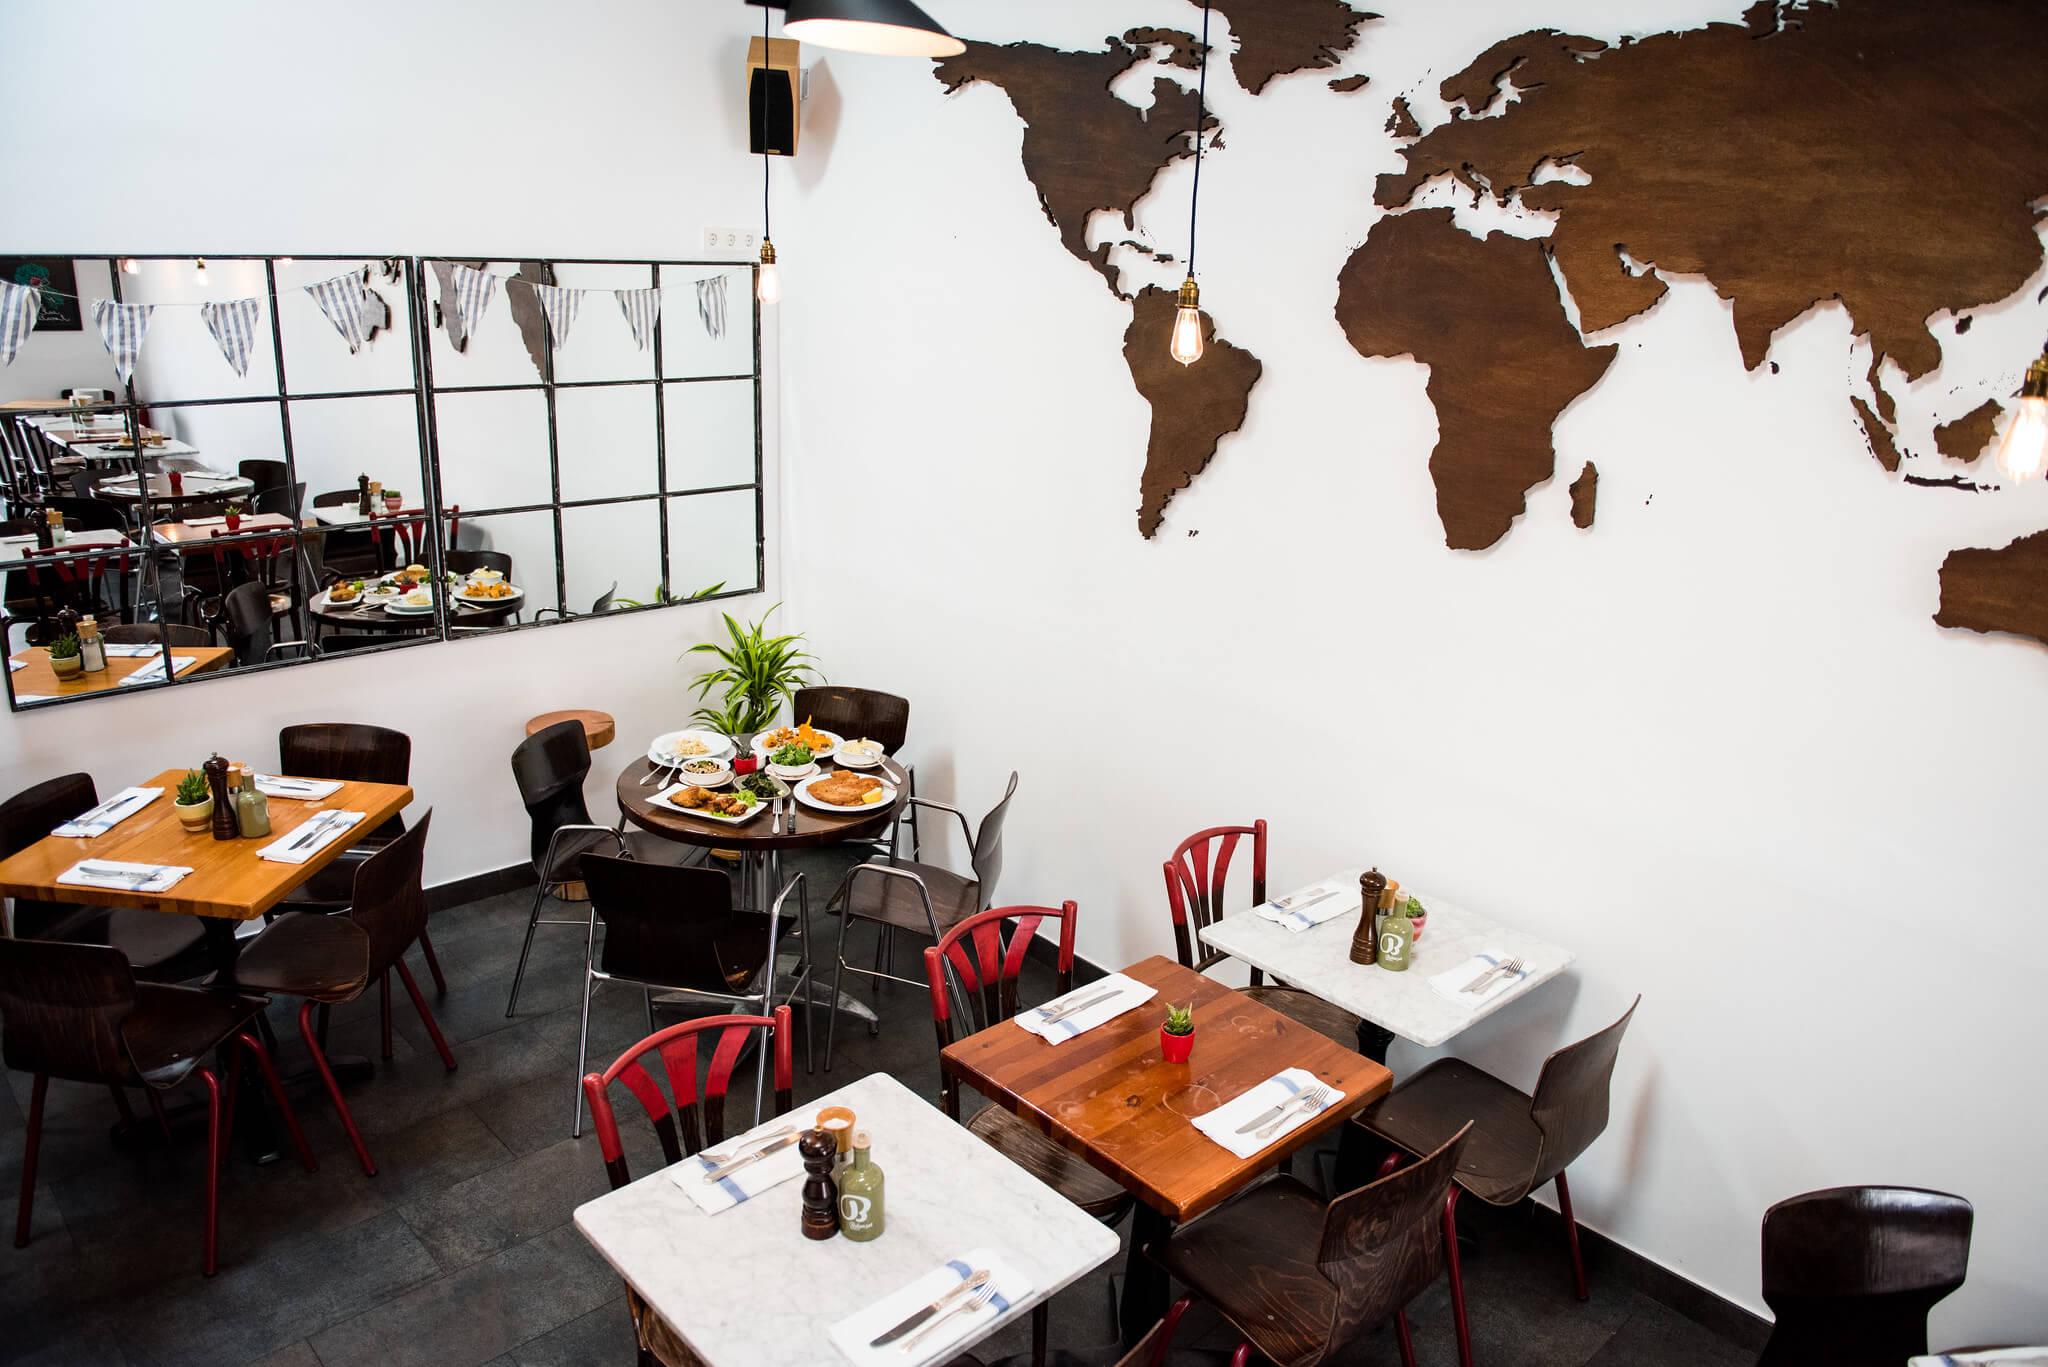 https://www.white-ibiza.com/wp-content/uploads/2020/03/white-ibiza-restaurants-locals-only-2020-01.jpg